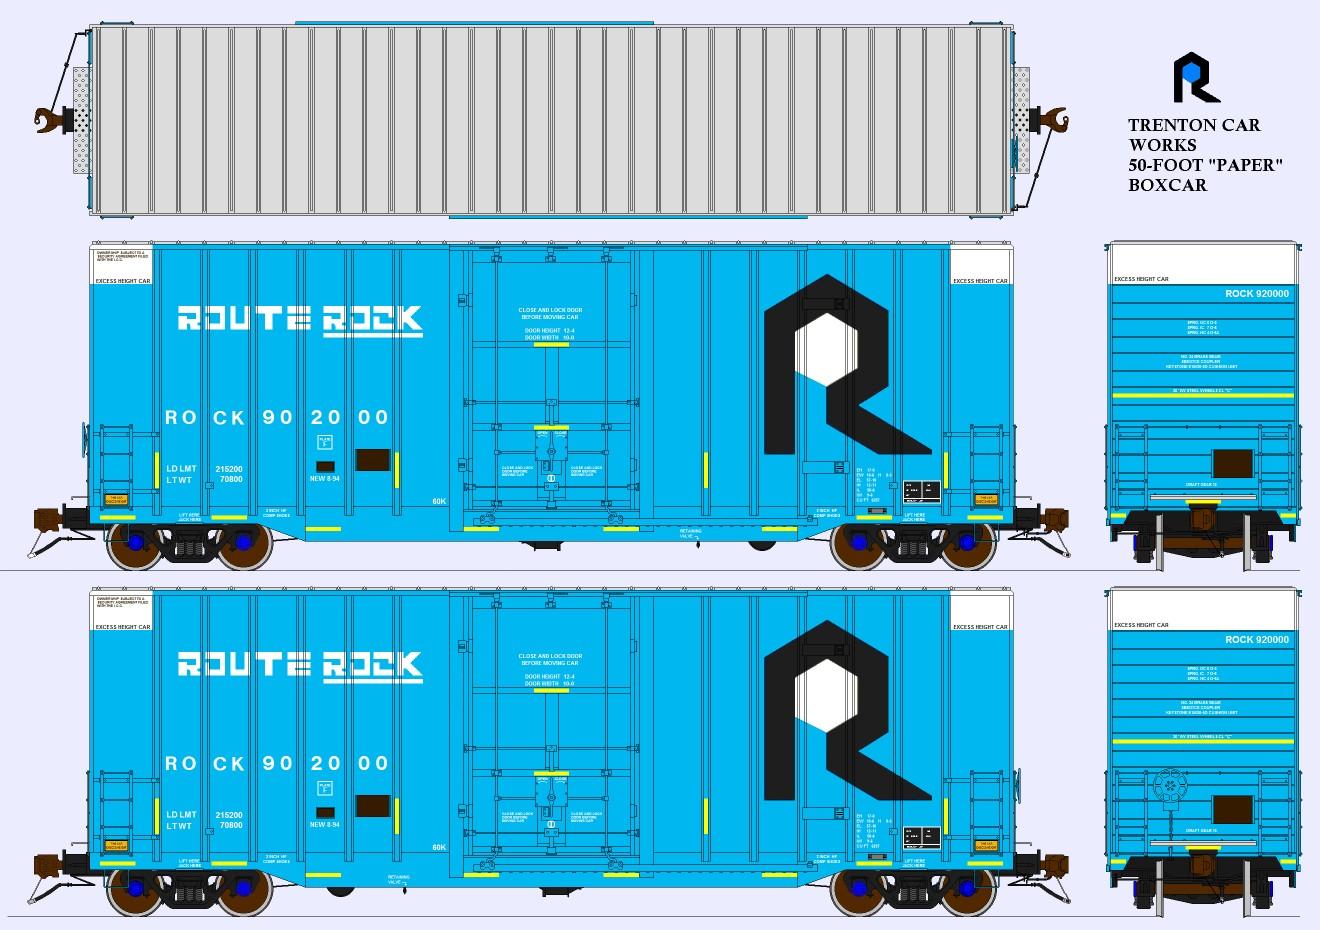 80425_ROCK_Trenton_Paper_Box_21320_x_9308_122_375lo.jpg